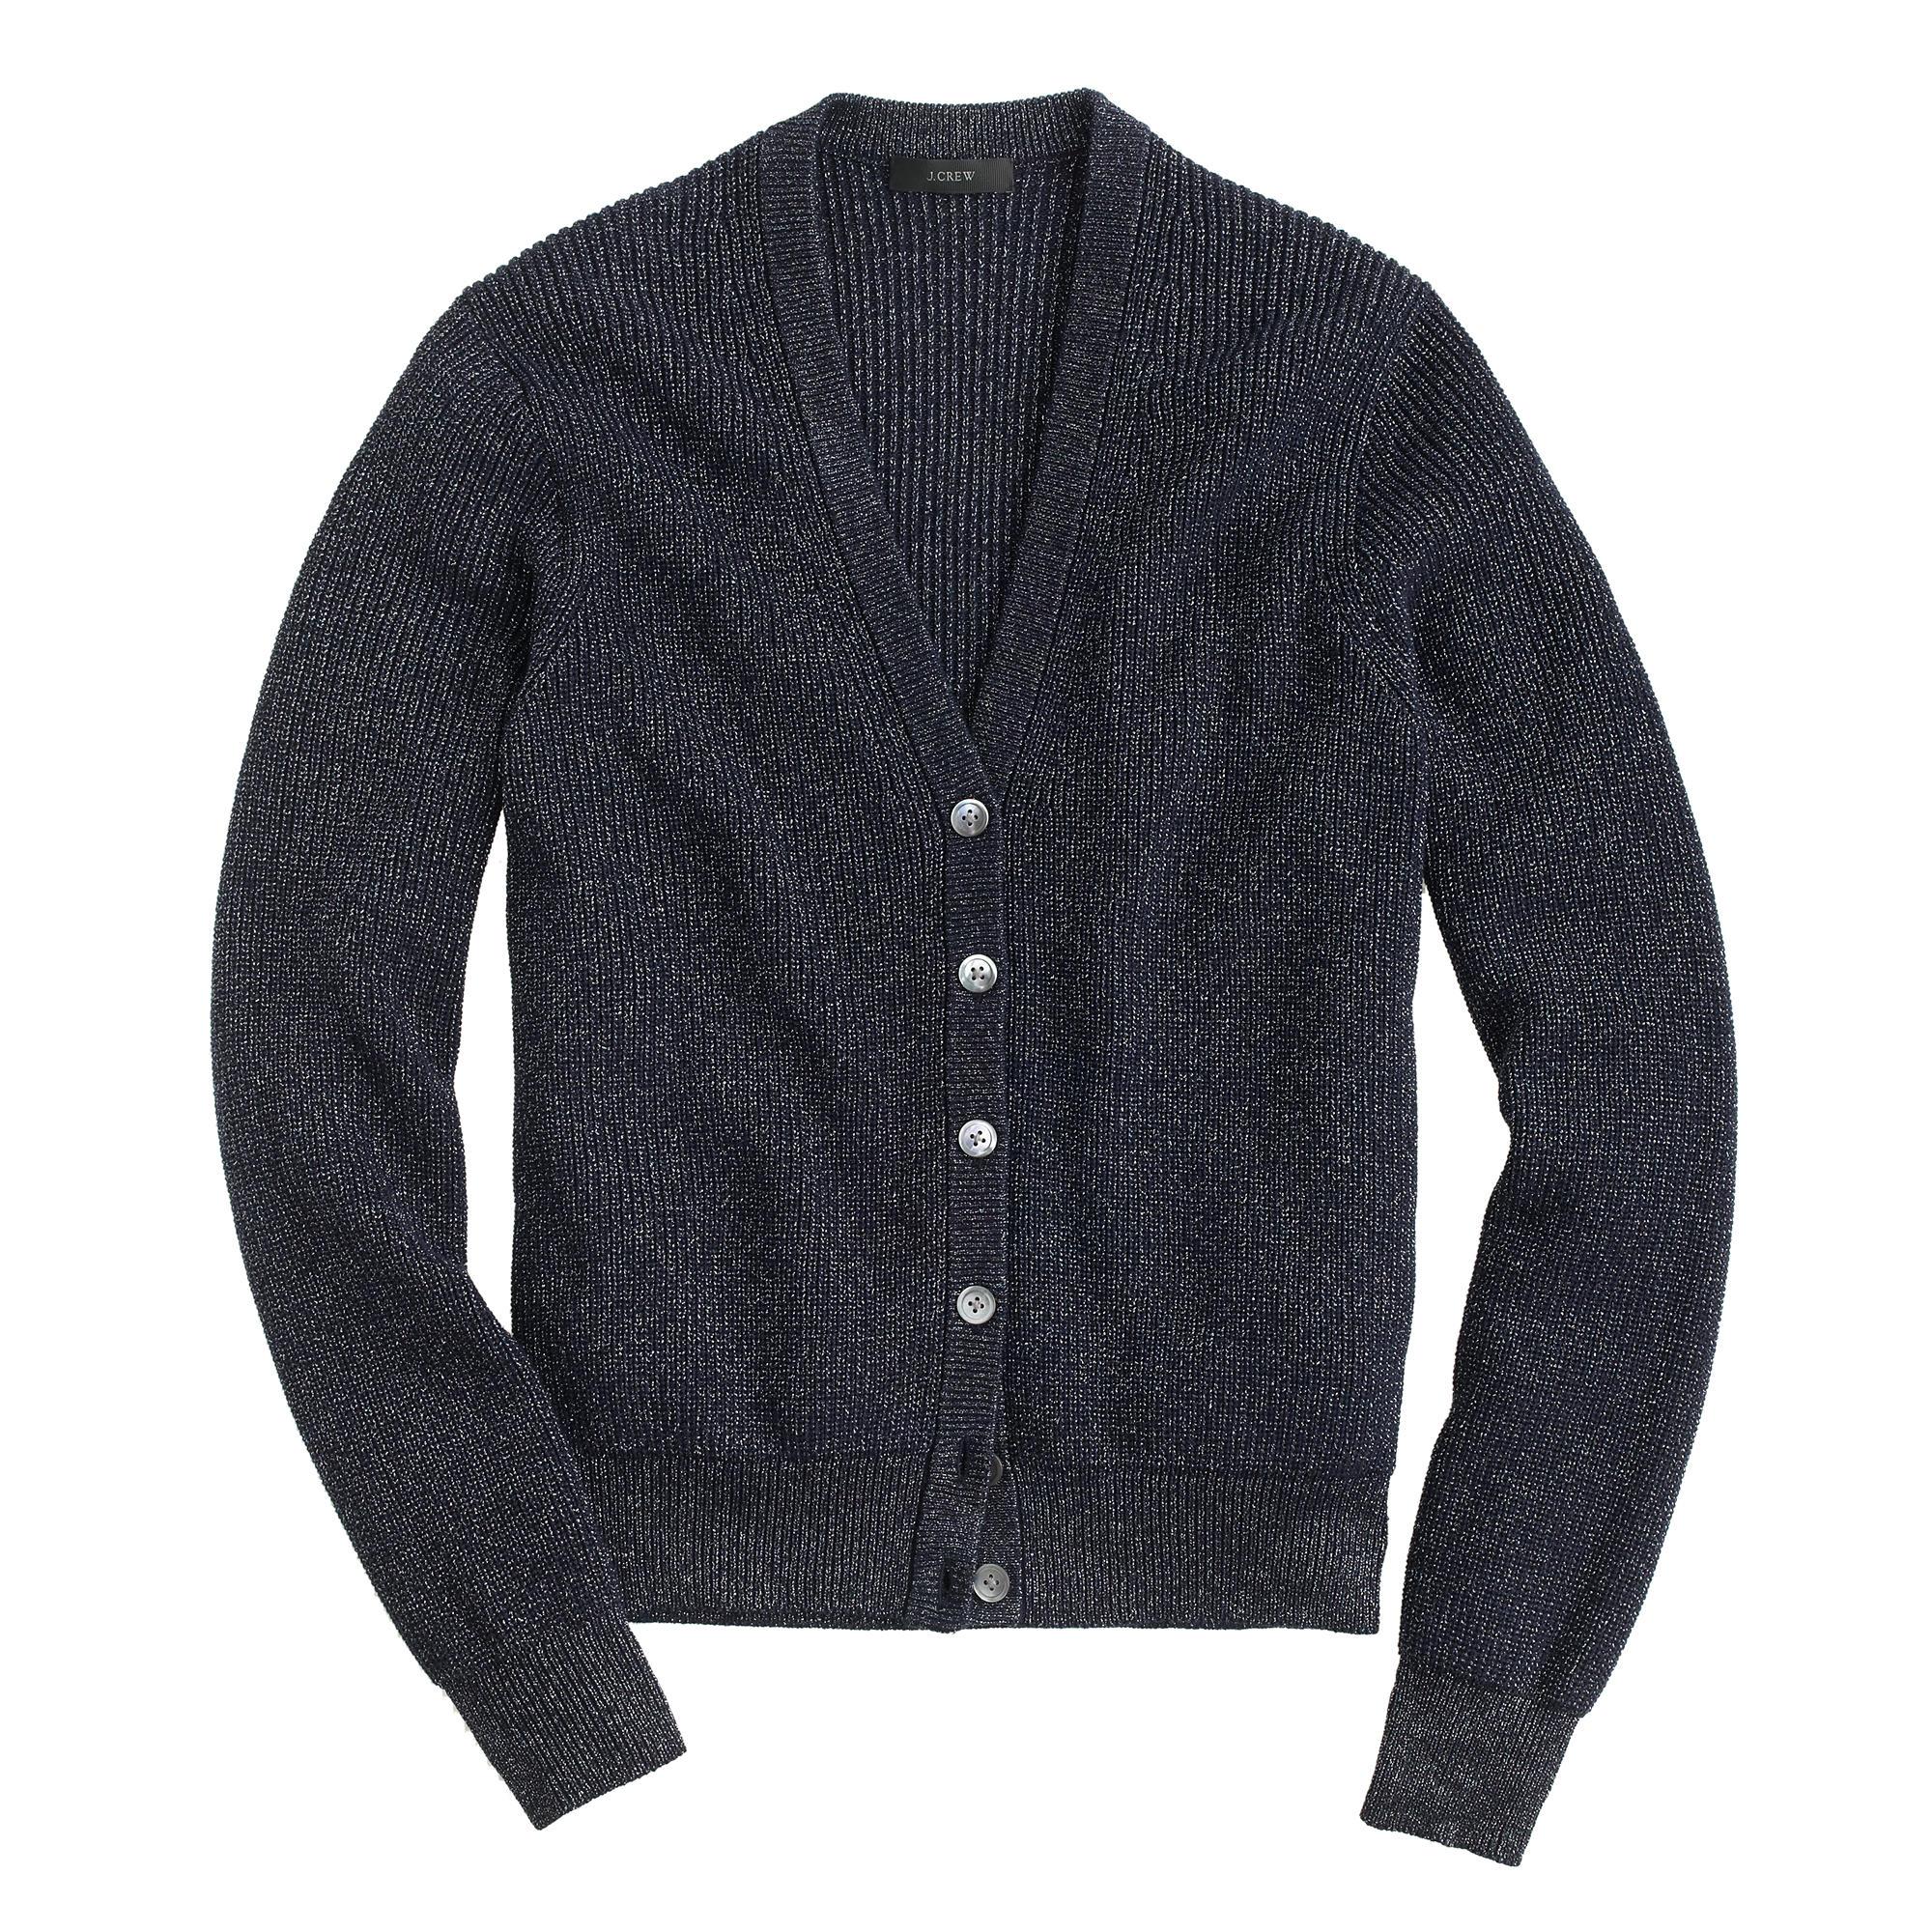 Hollister Oberbekleidung Returns Exchanges Hollister Pullover Hollister Hoodies Hollister Jeans: J.Crew Denim Ribbed Metallic Cardigan Sweater In Blue For